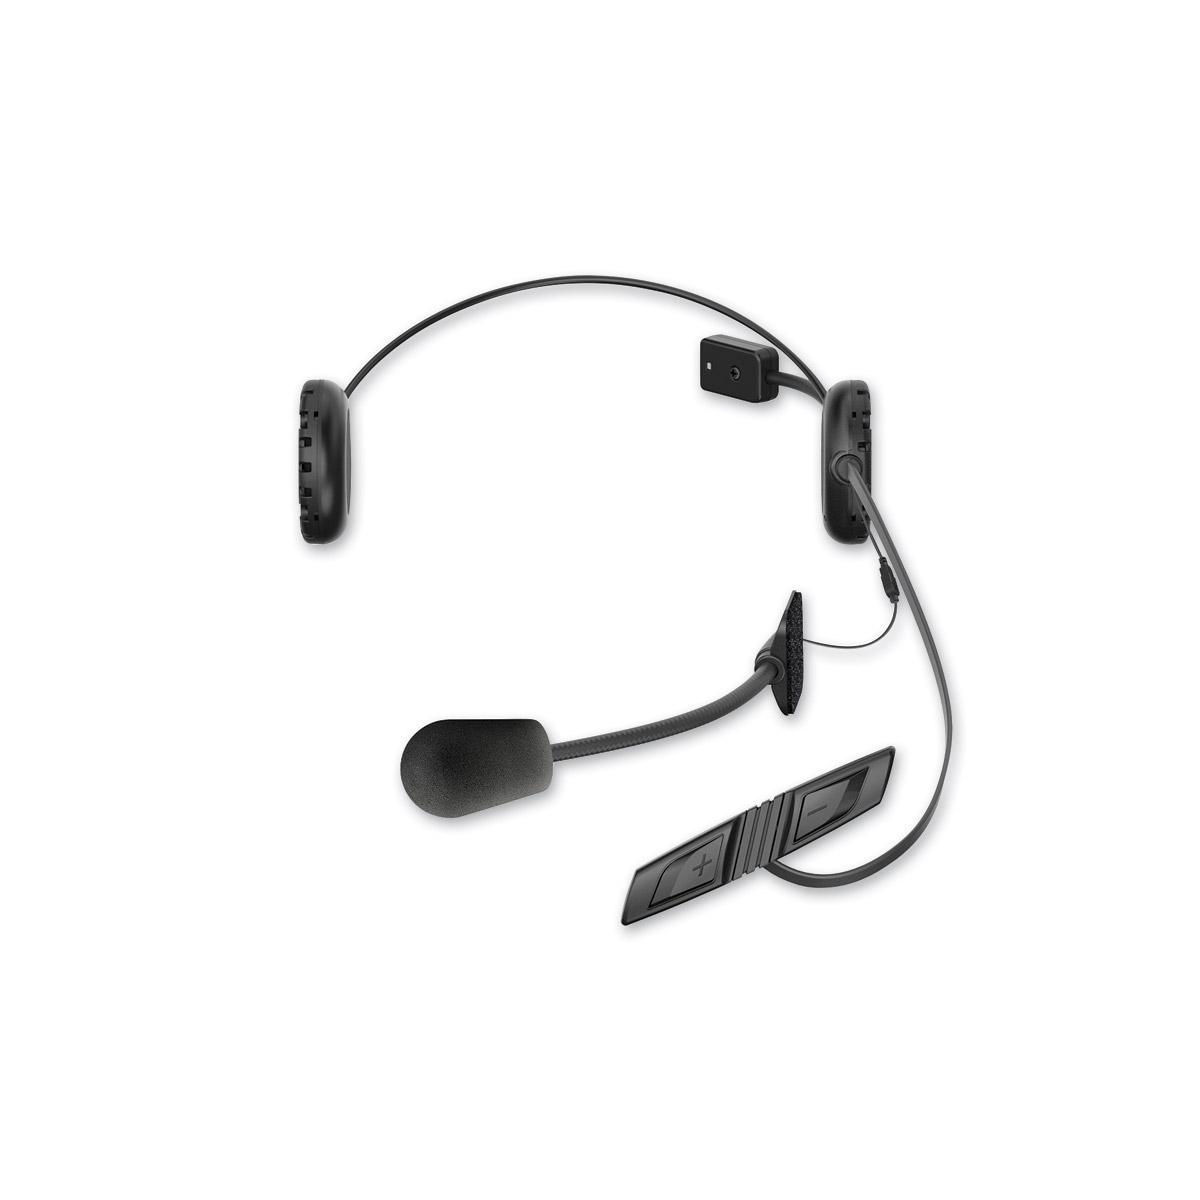 Sena Technologies 3S Single Modular Helmet Wired Boom Microphone Kit - 3S-WB